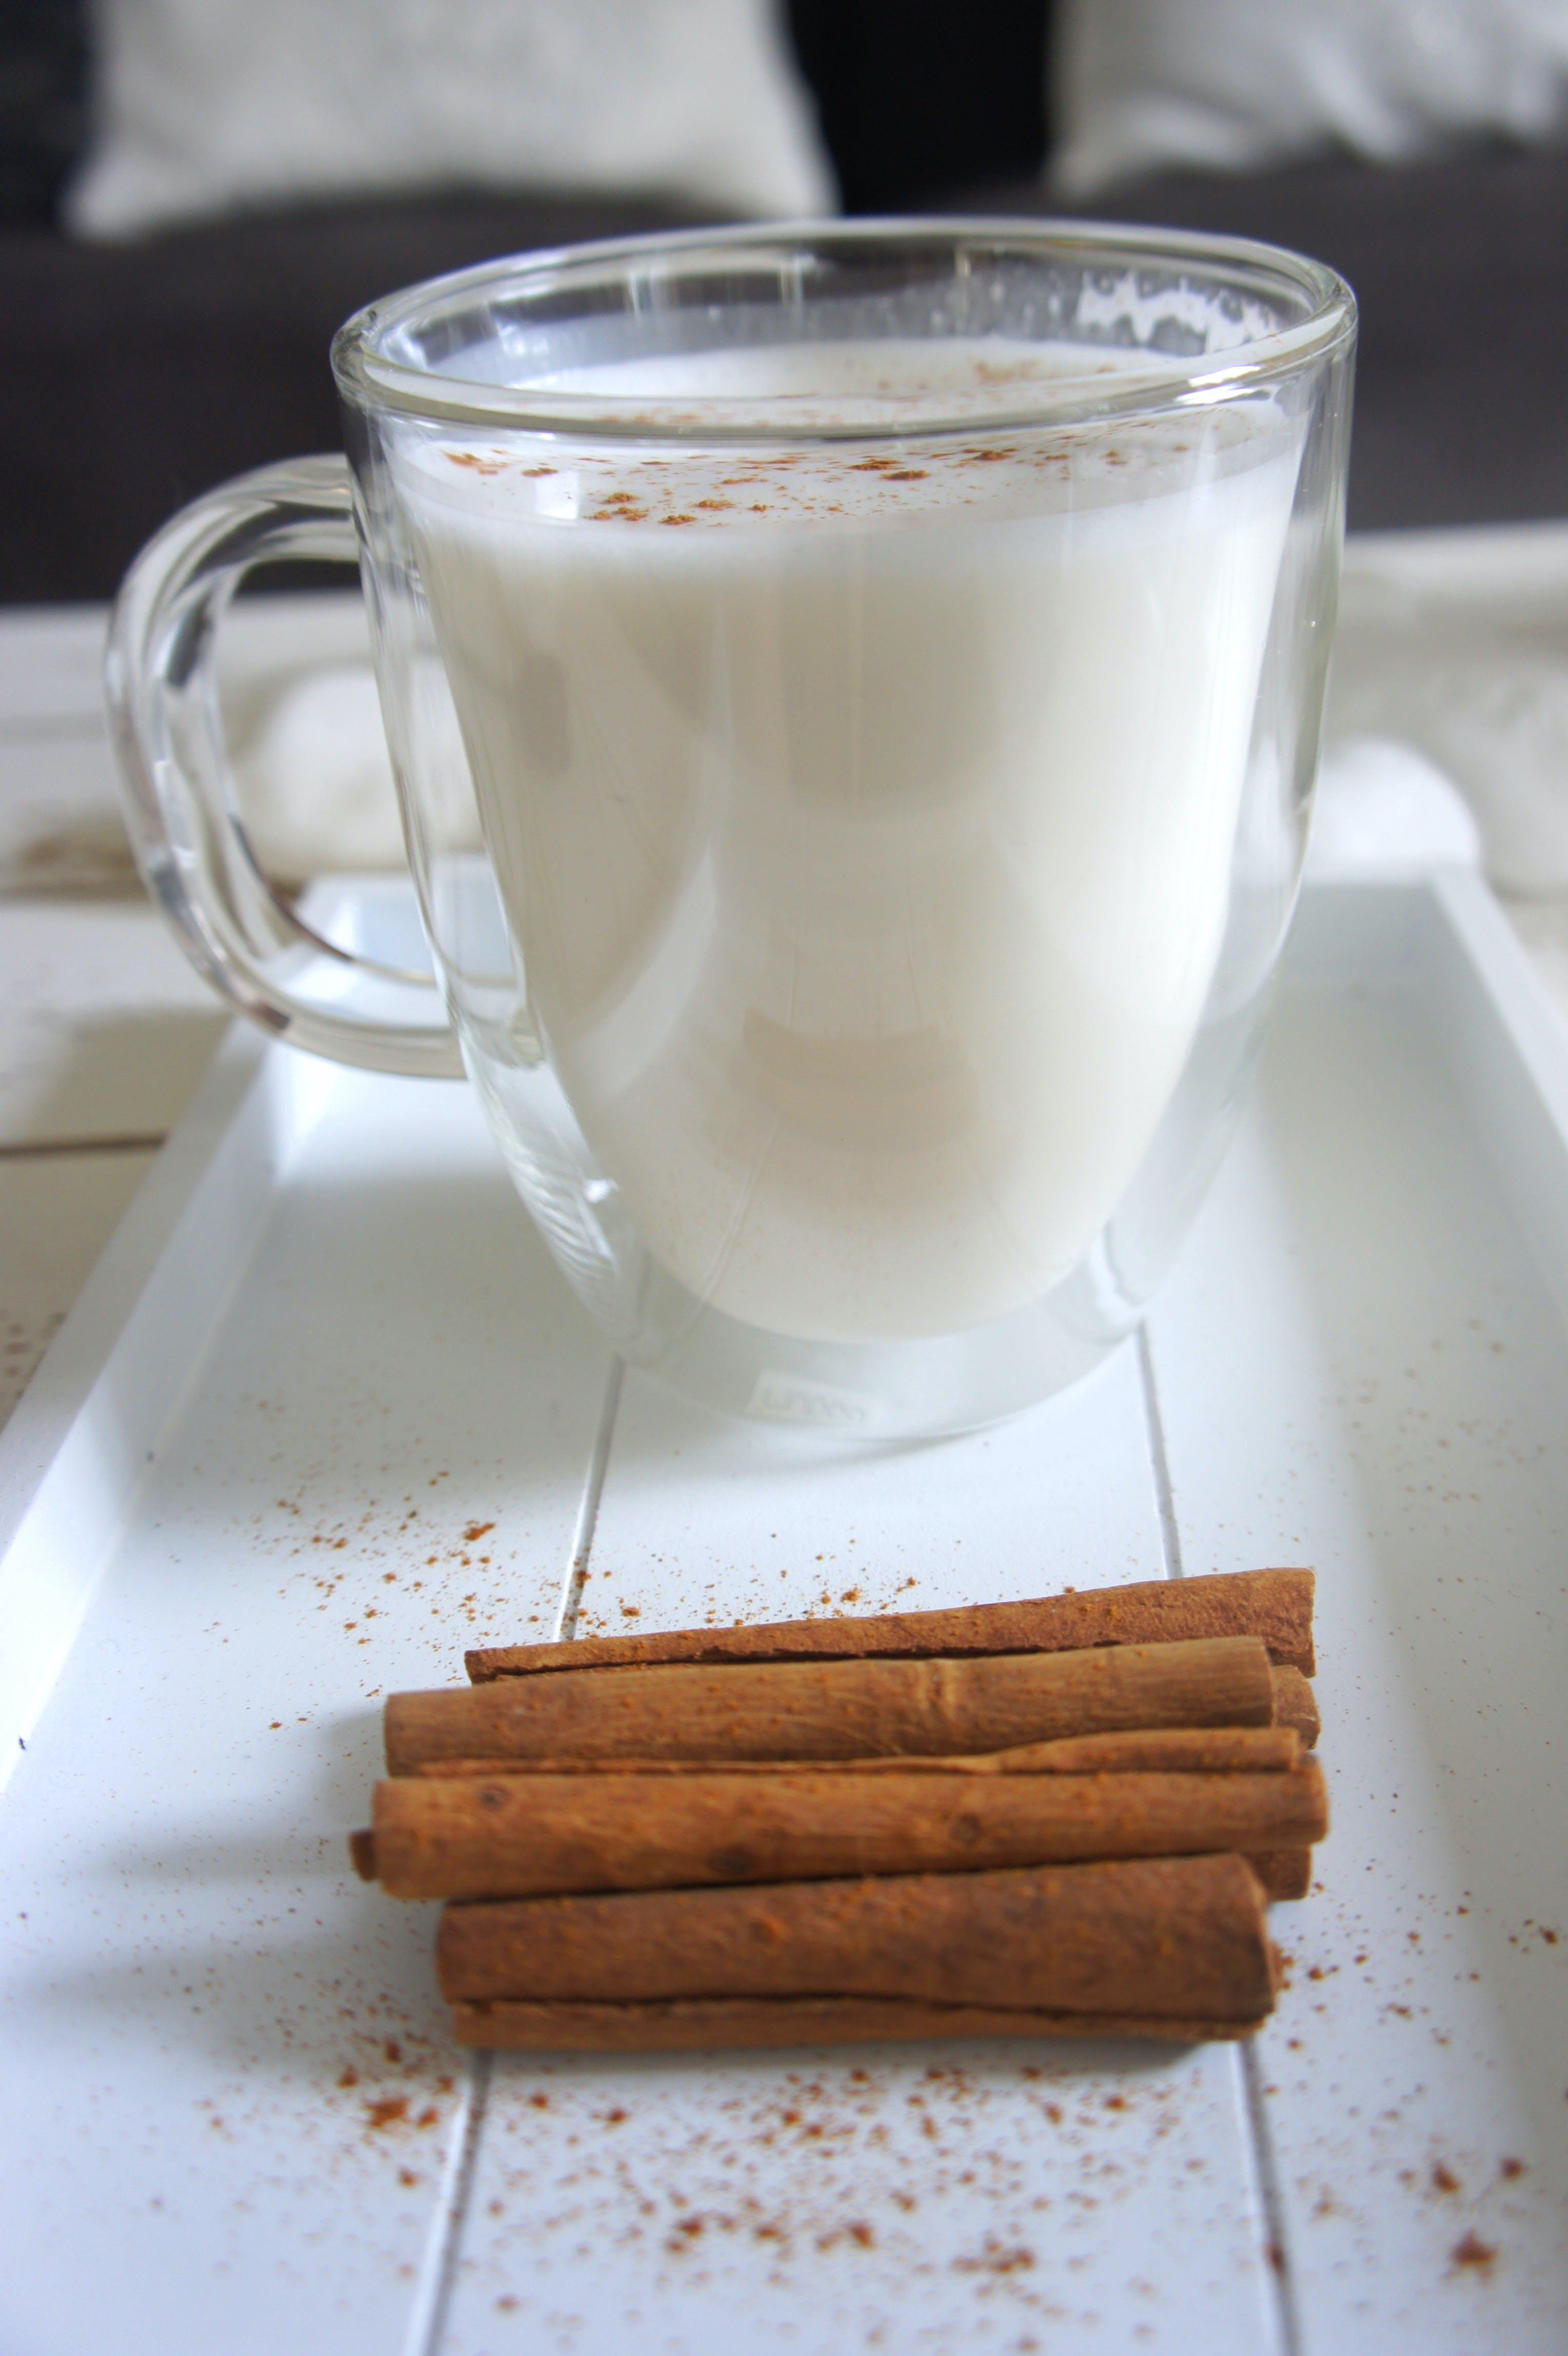 Fotos de stock gratuitas de atractivo, azúcar, beber, canela